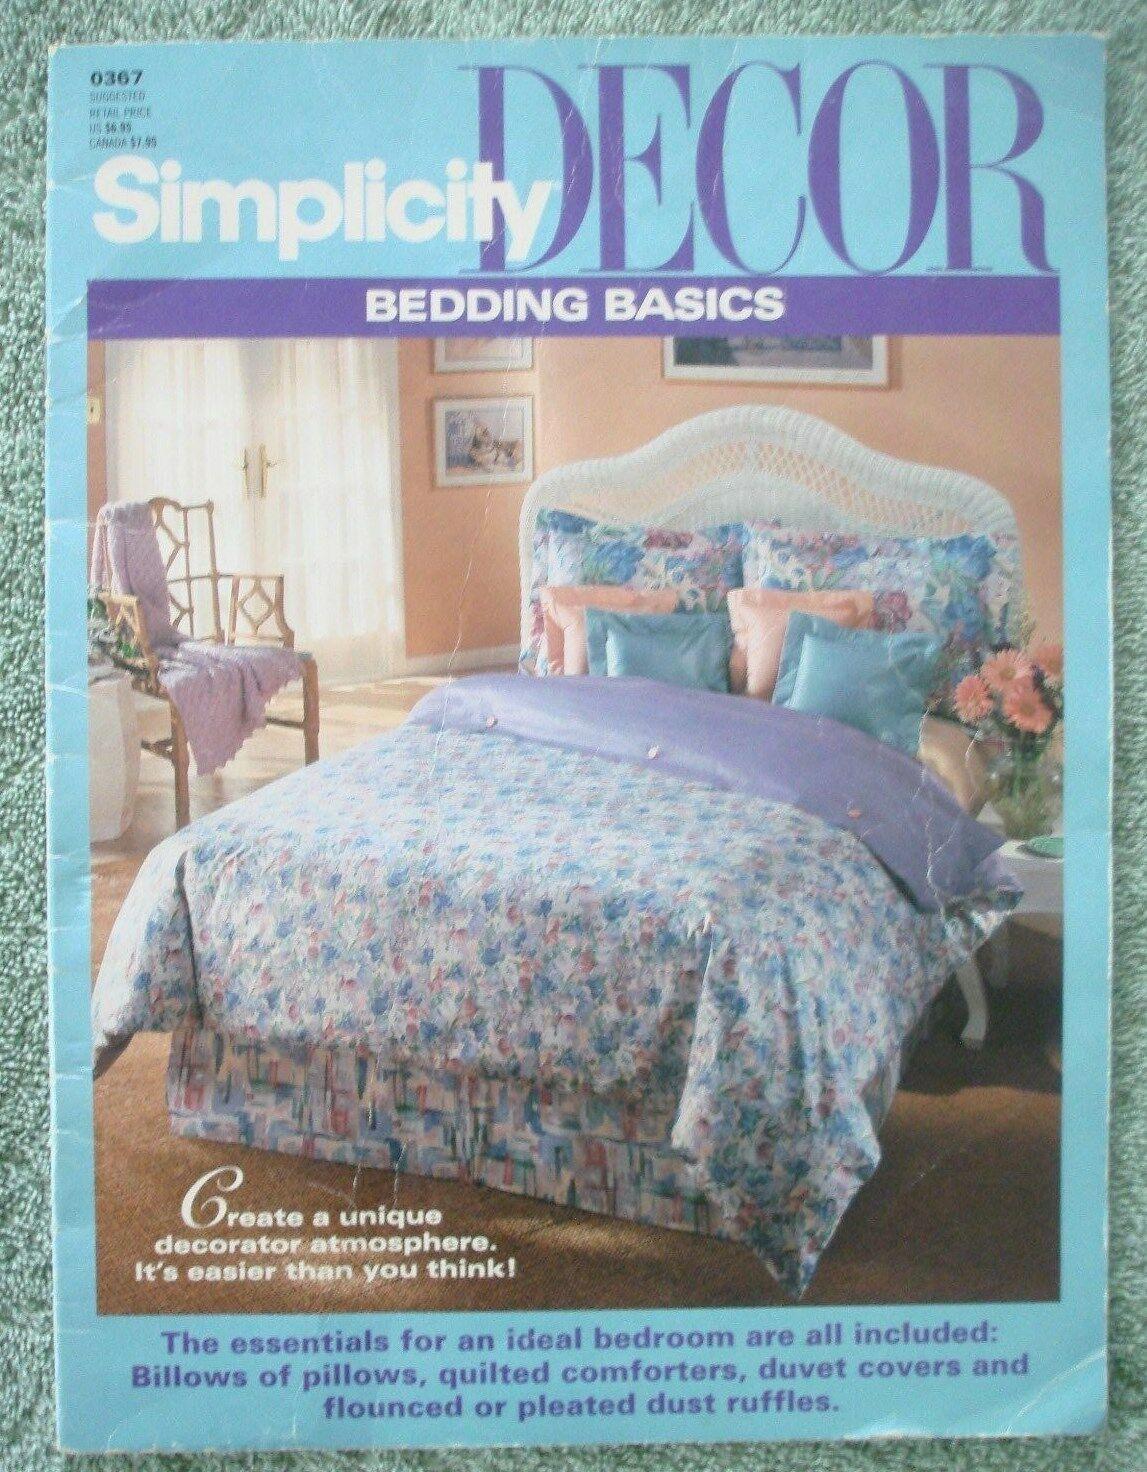 Vtg 1993 Simplicity DECOR Bedding Basics Instructional Pillows Comforters Duvets